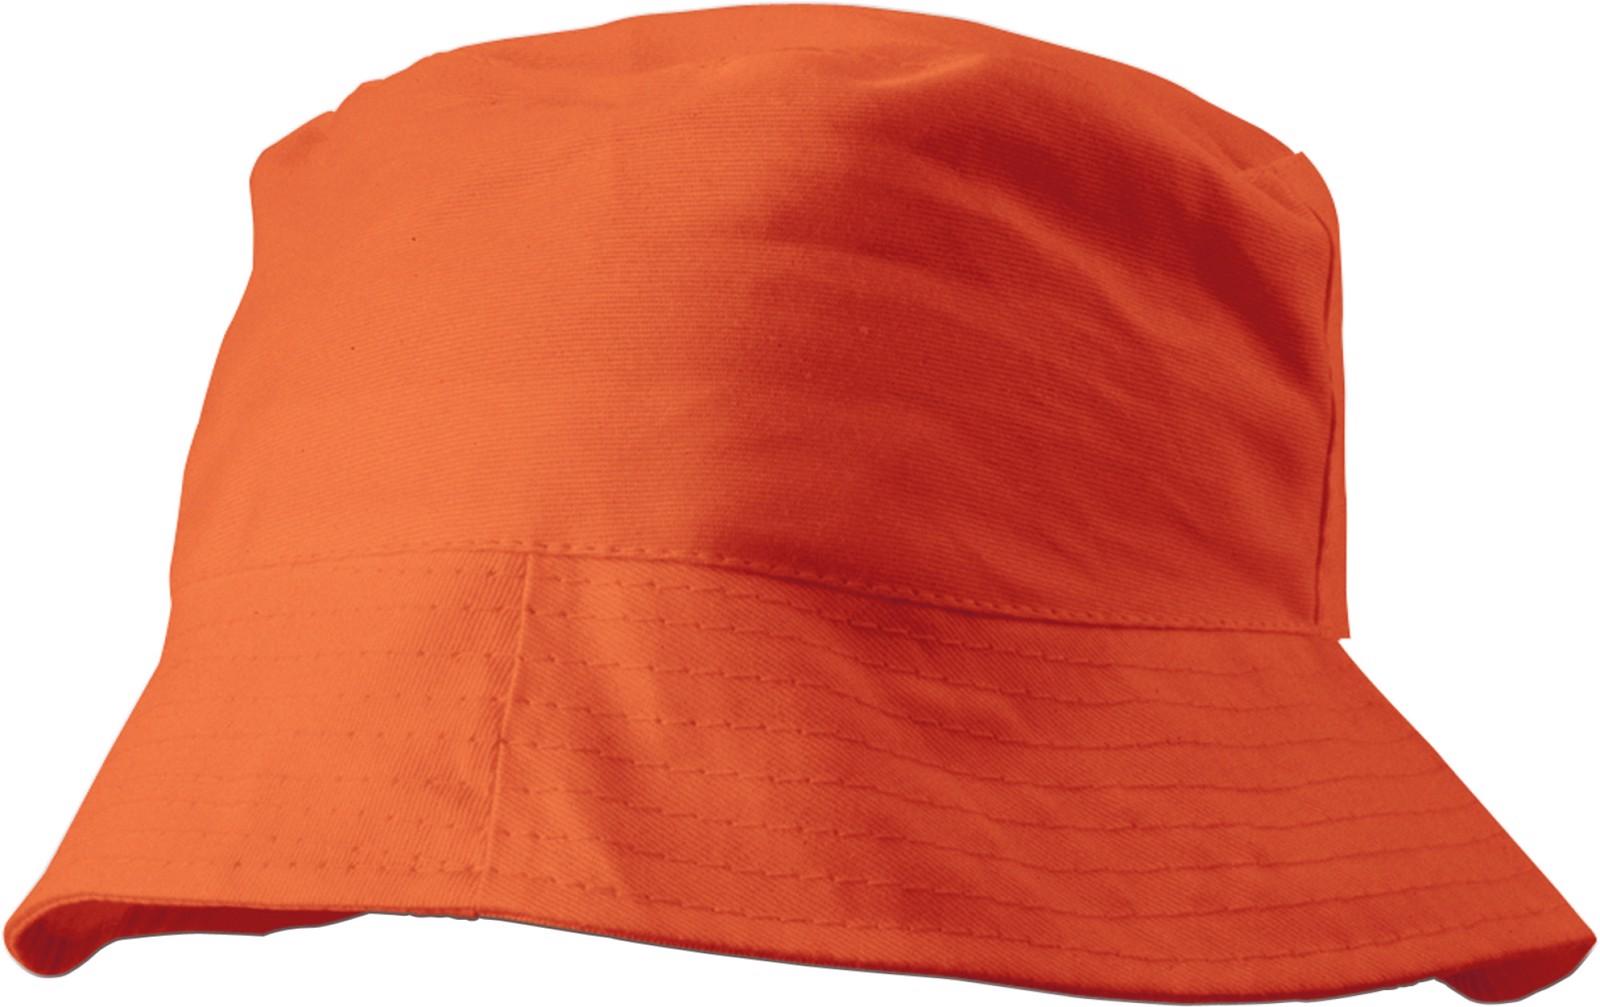 Cotton sun hat - Orange